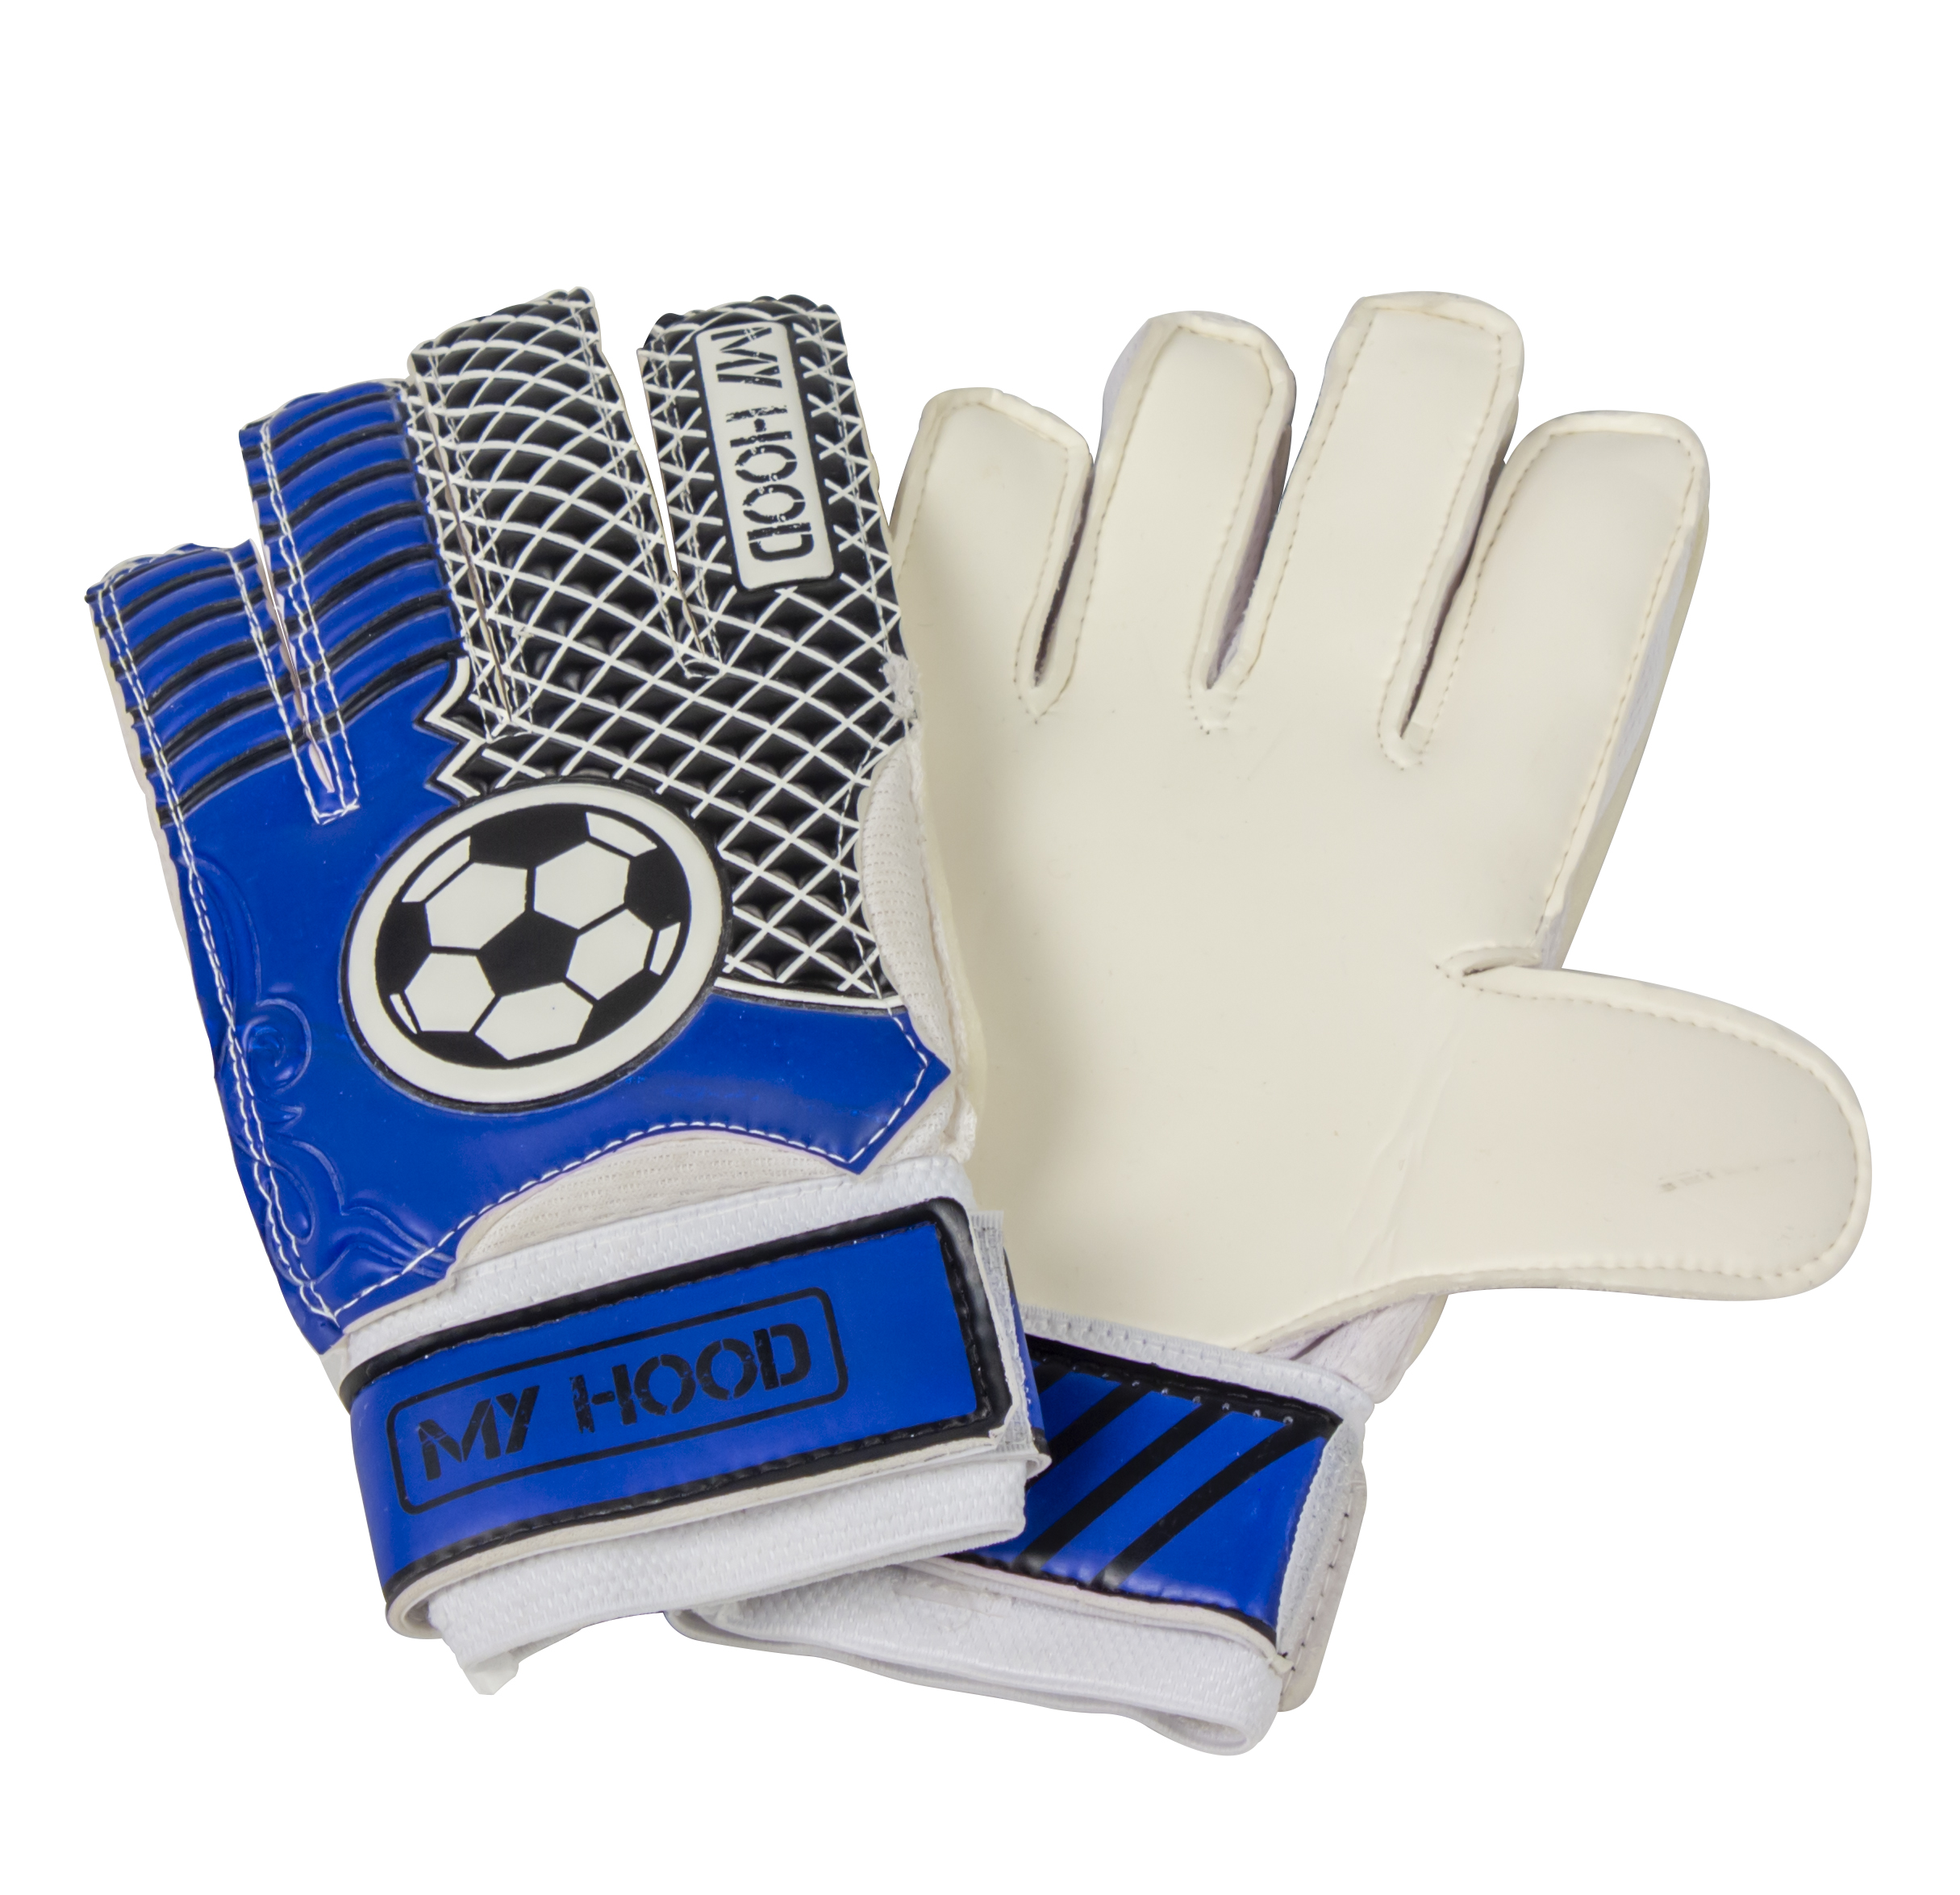 My Hood - Goalkeeper Gloves (M)